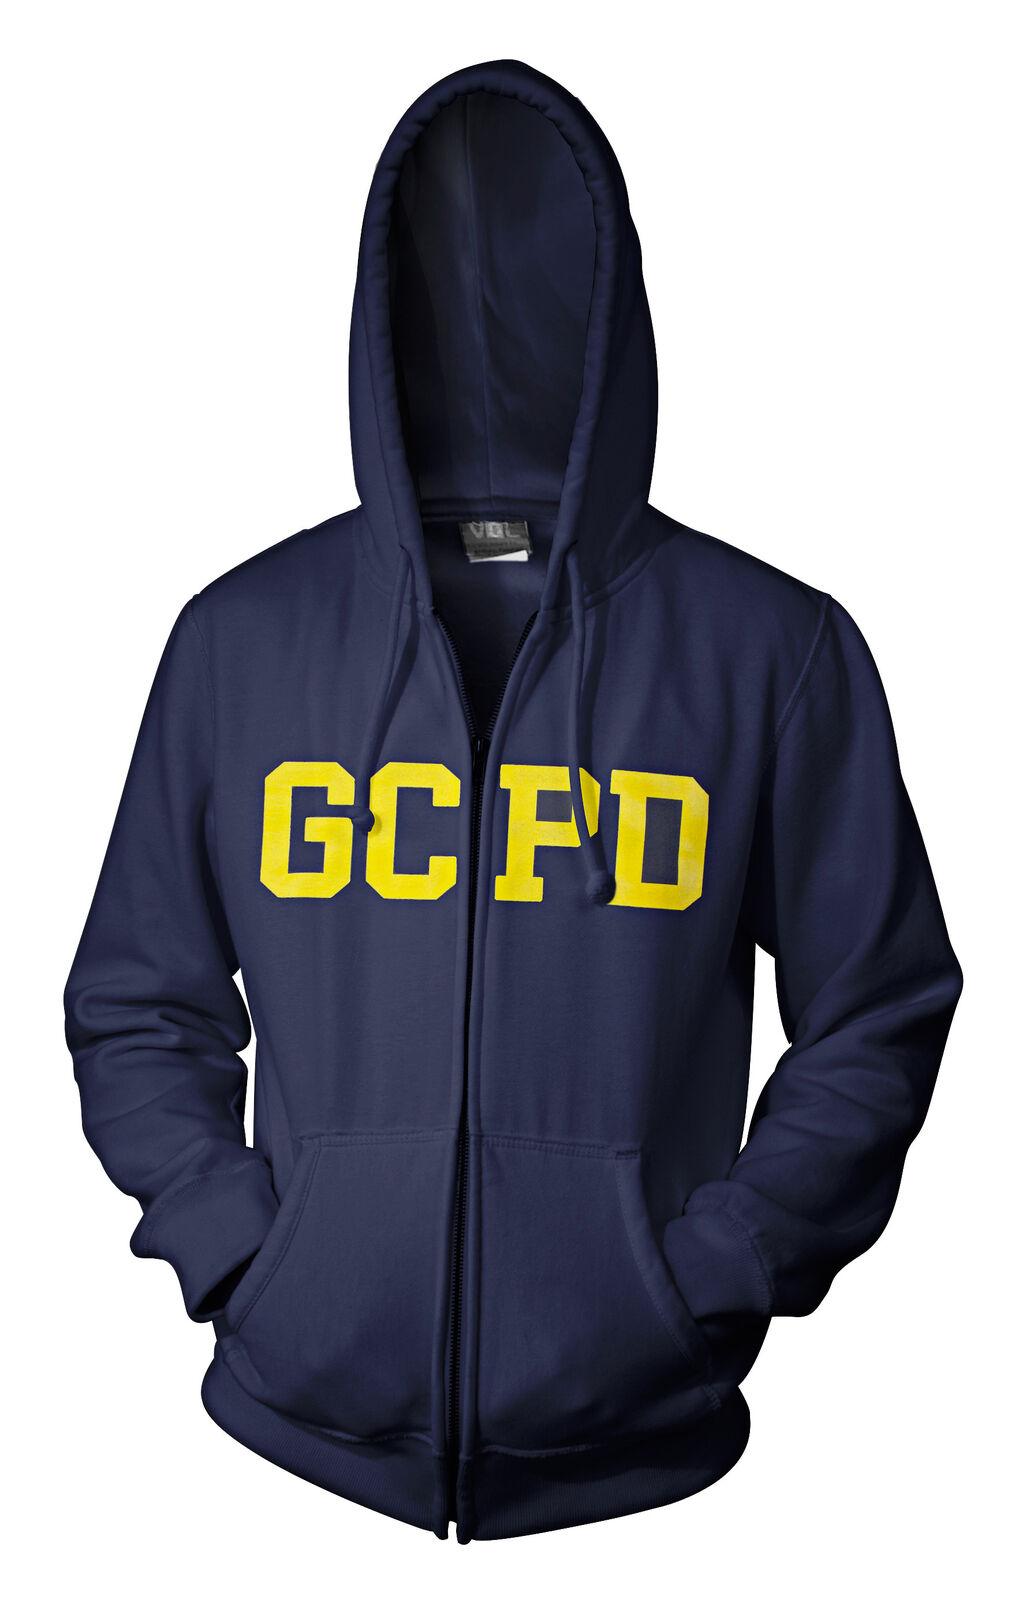 DC Gotham City Police Department  Cadete Con Capucha Sudadera Cremallera  de moda